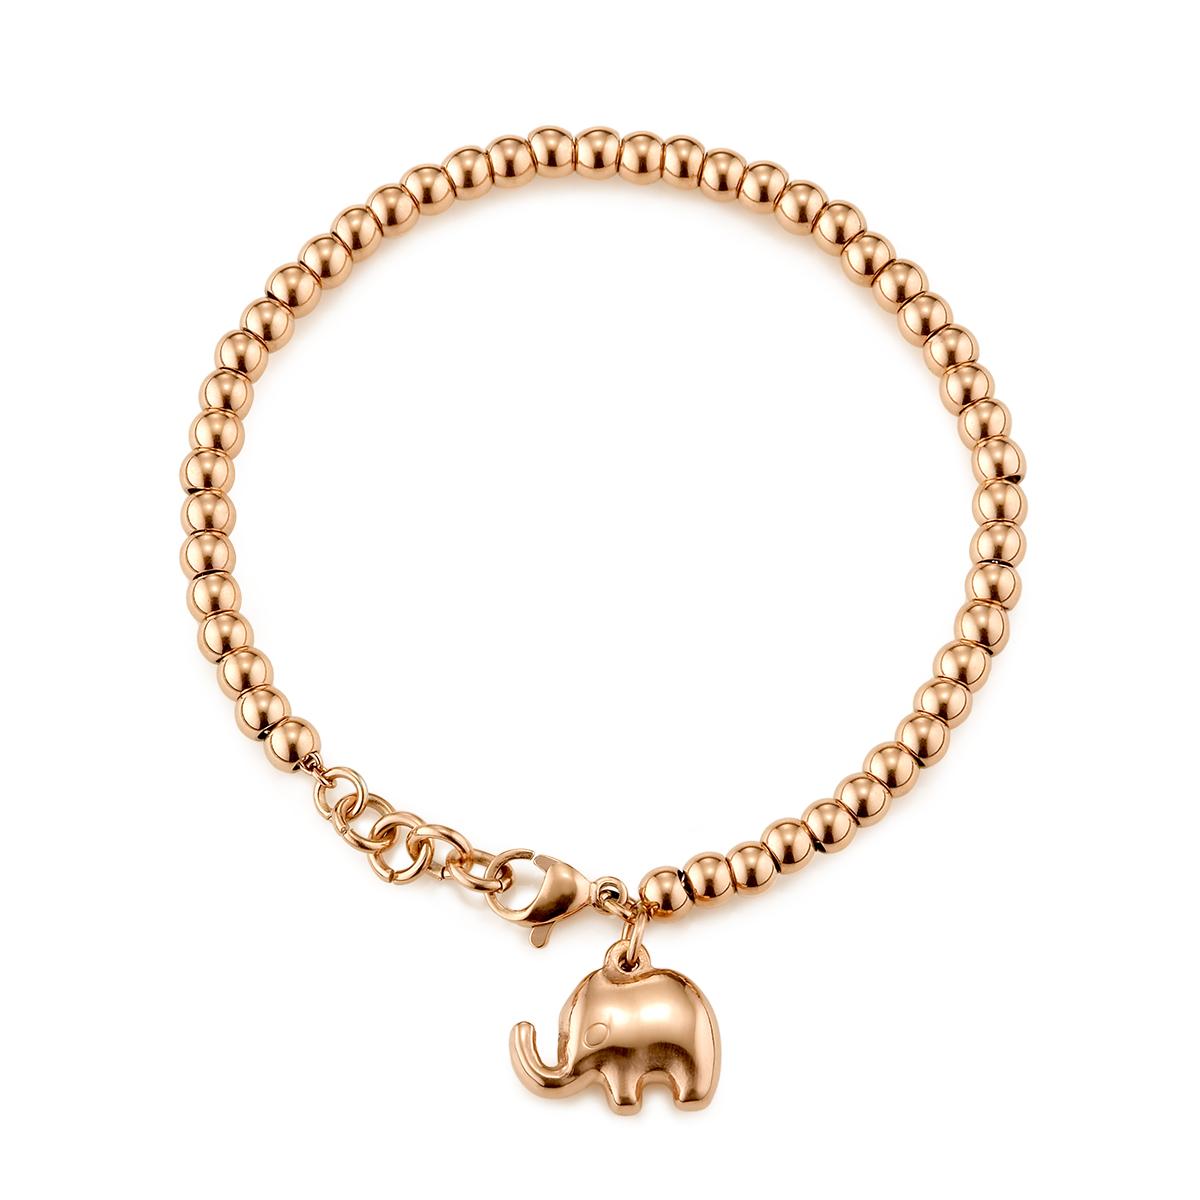 CX187 點滴意象-自由大象串珠手鍊